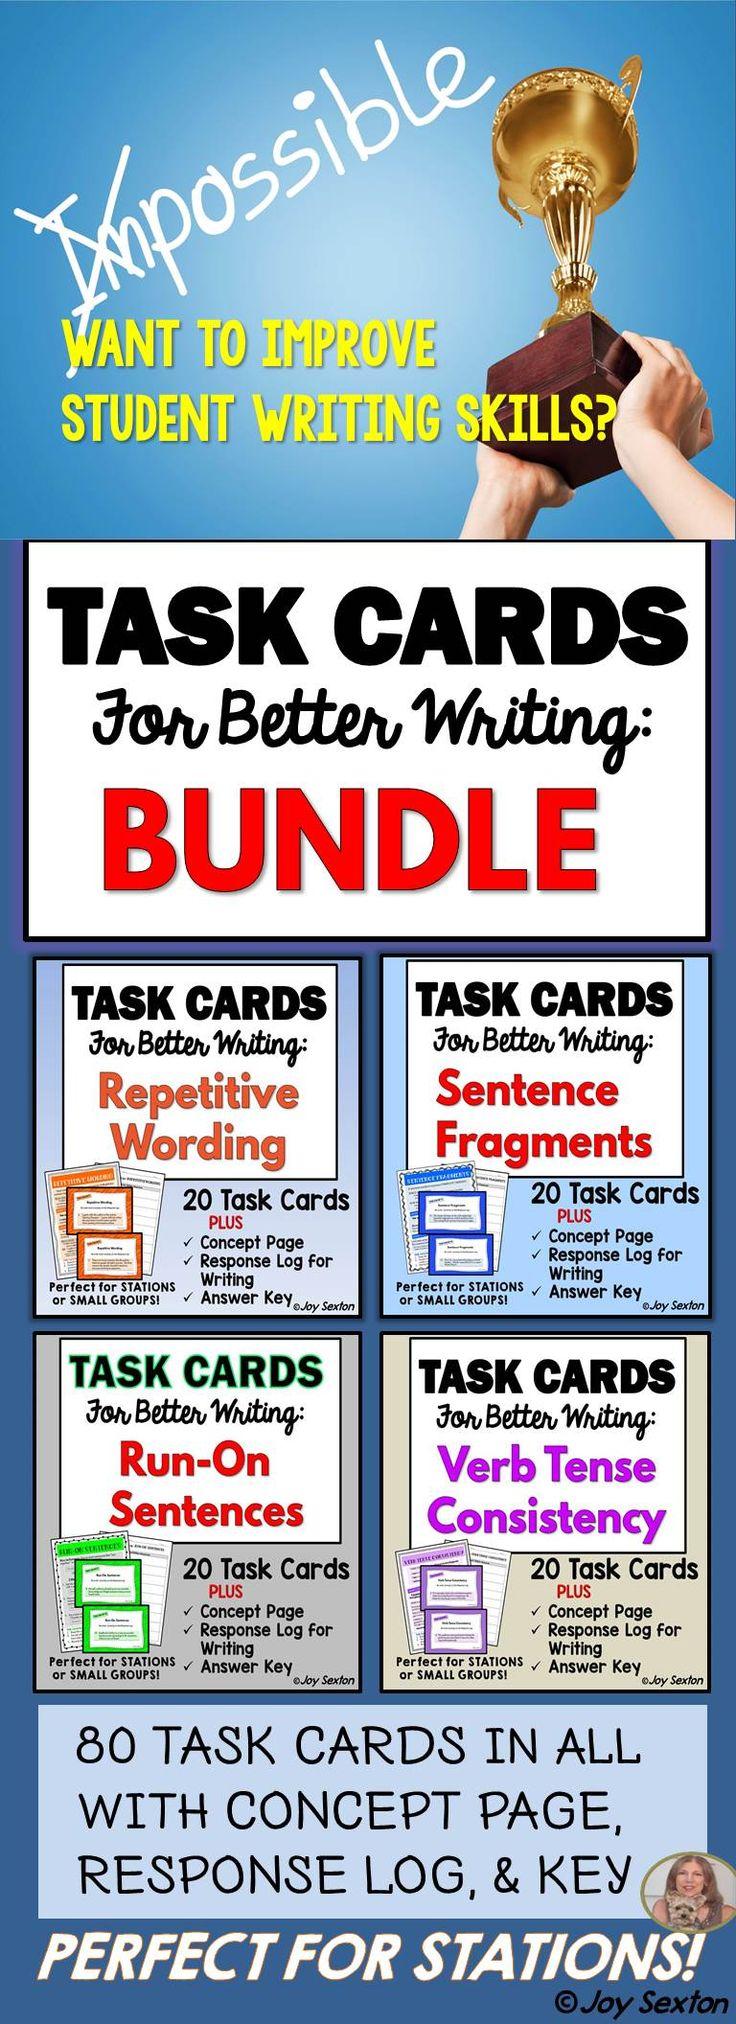 Benefit running essay